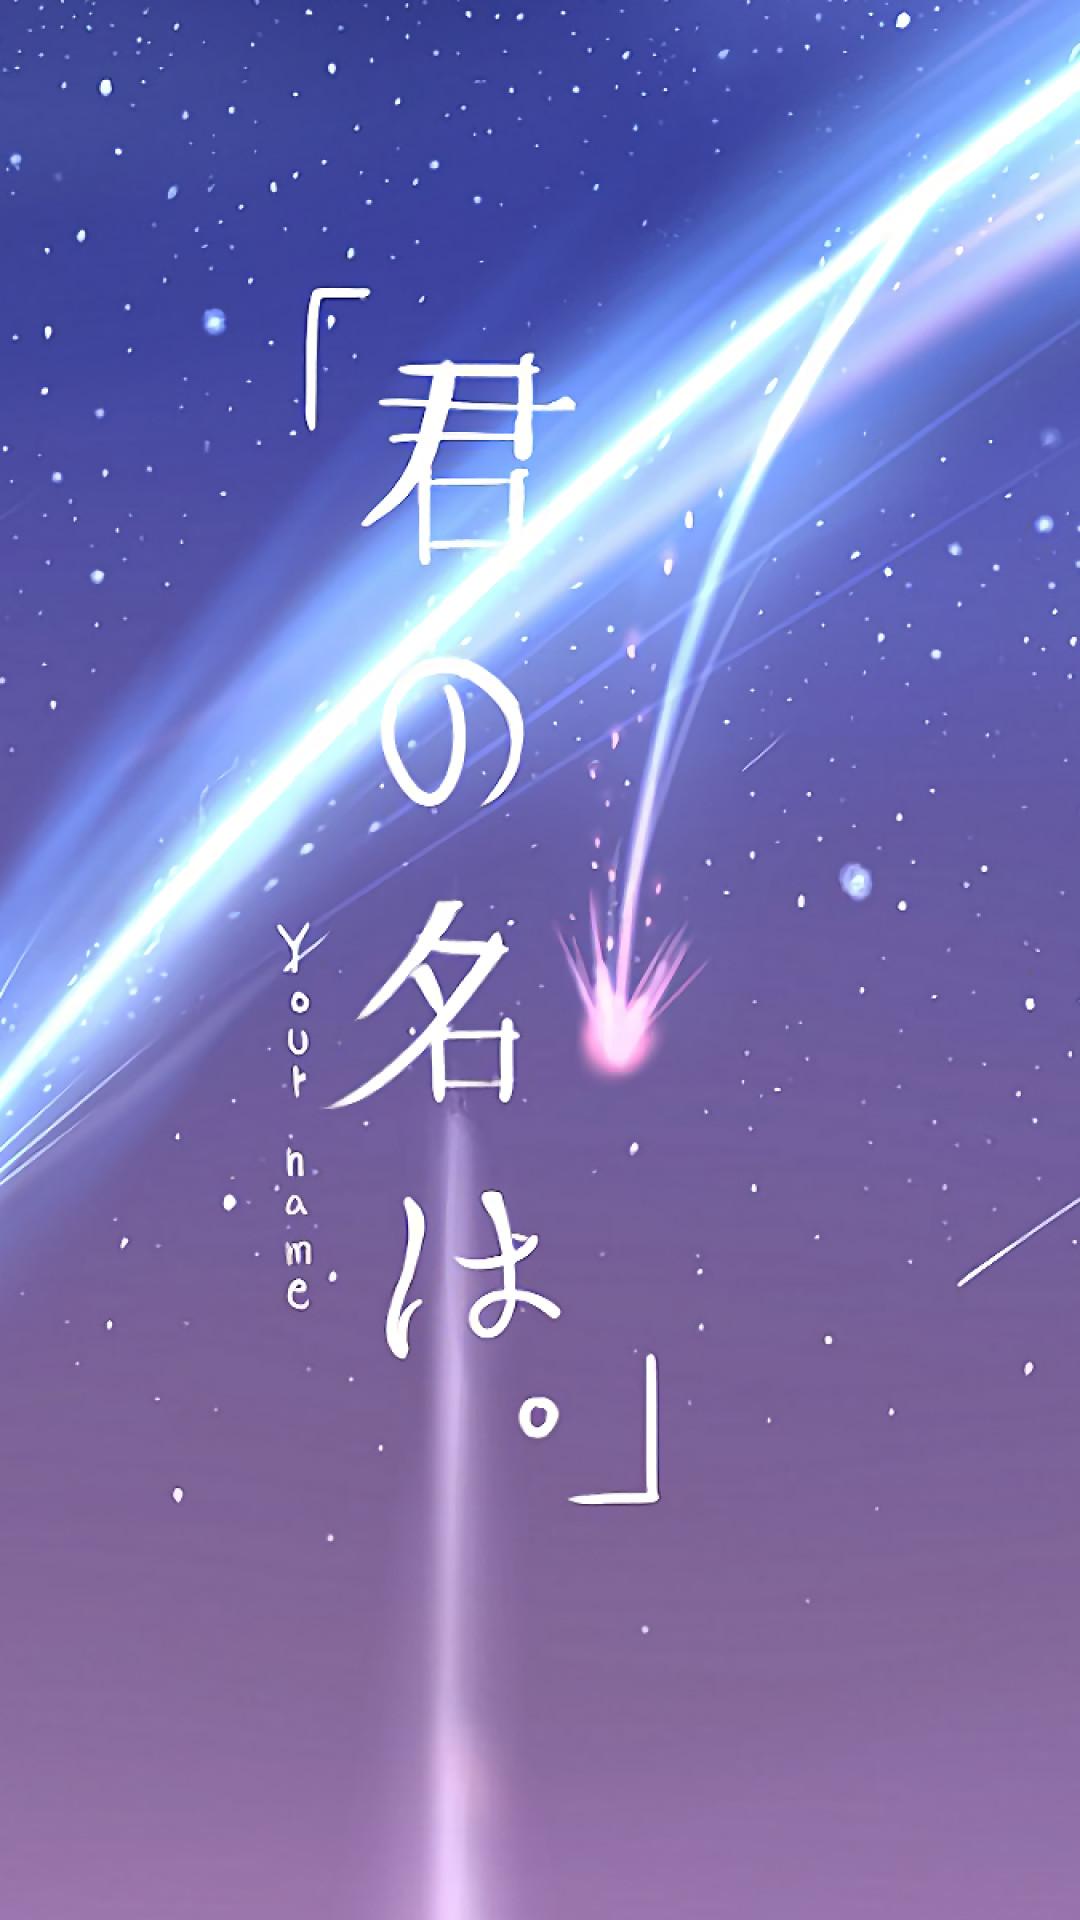 Kimi No Na Wa 1080p Wallpaper Posted By Sarah Thompson